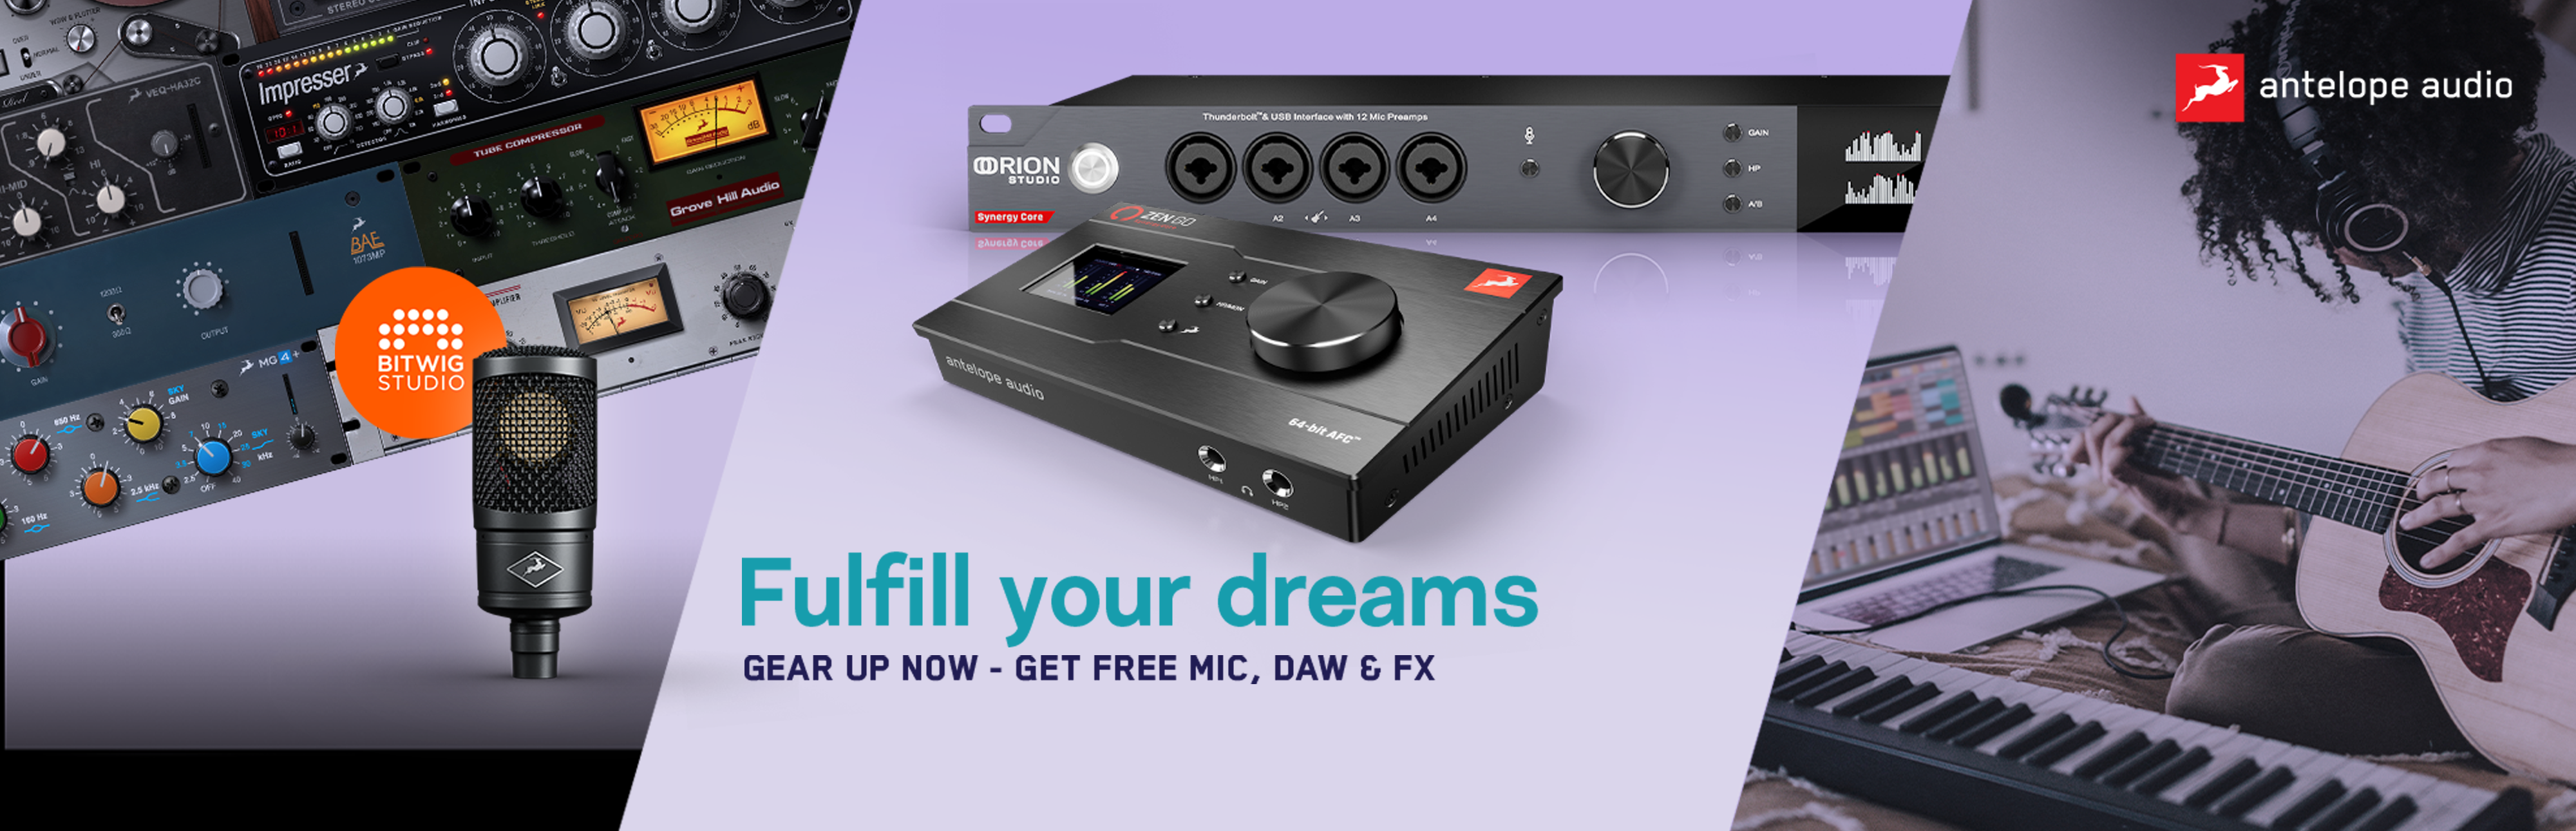 Antelope Audio   Fullfill Your Dreams